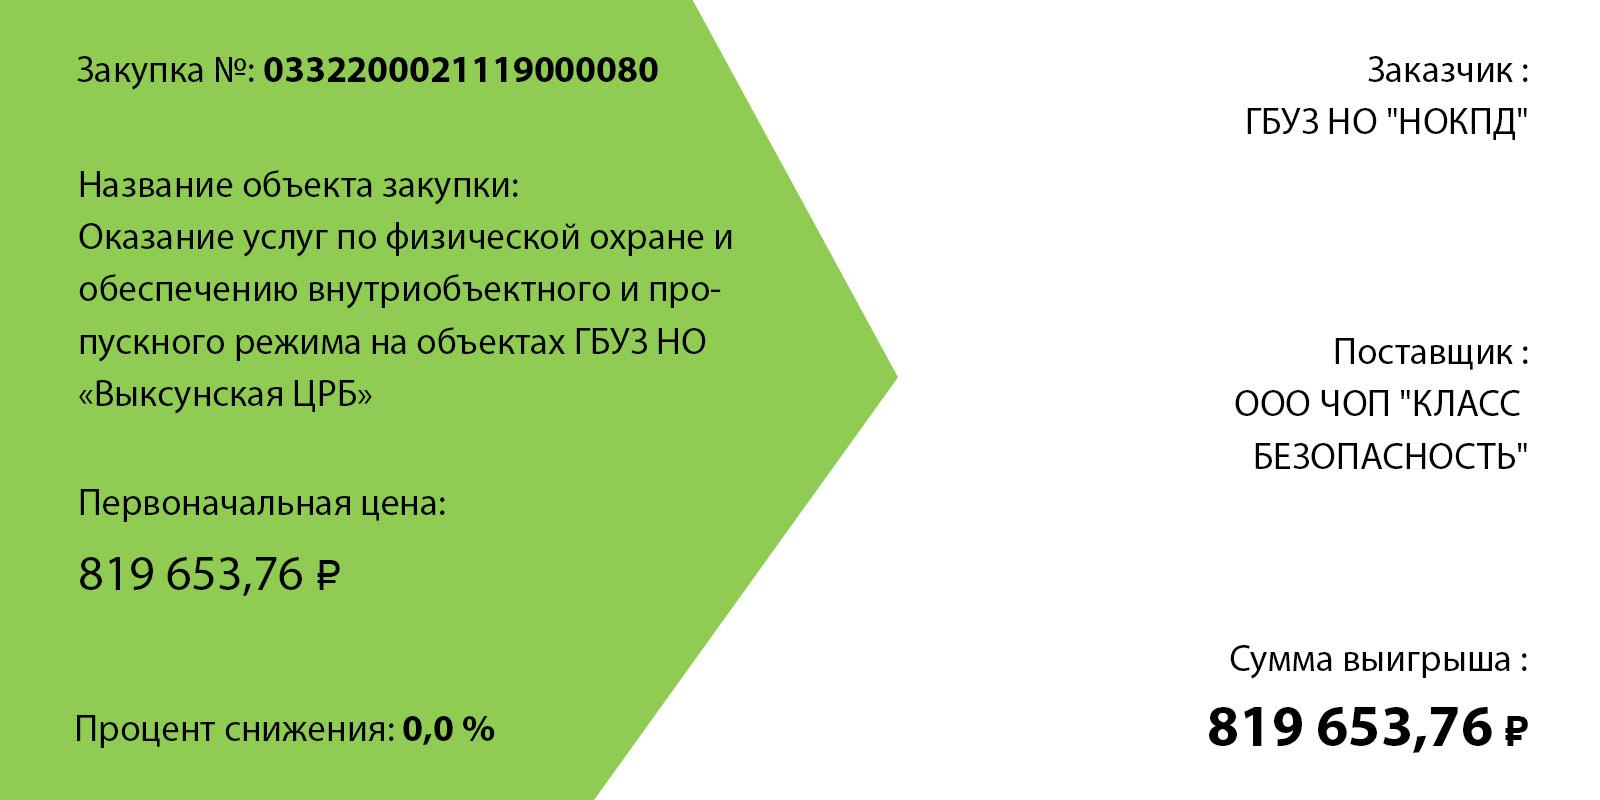 Выигранная закупка на сумму 819653